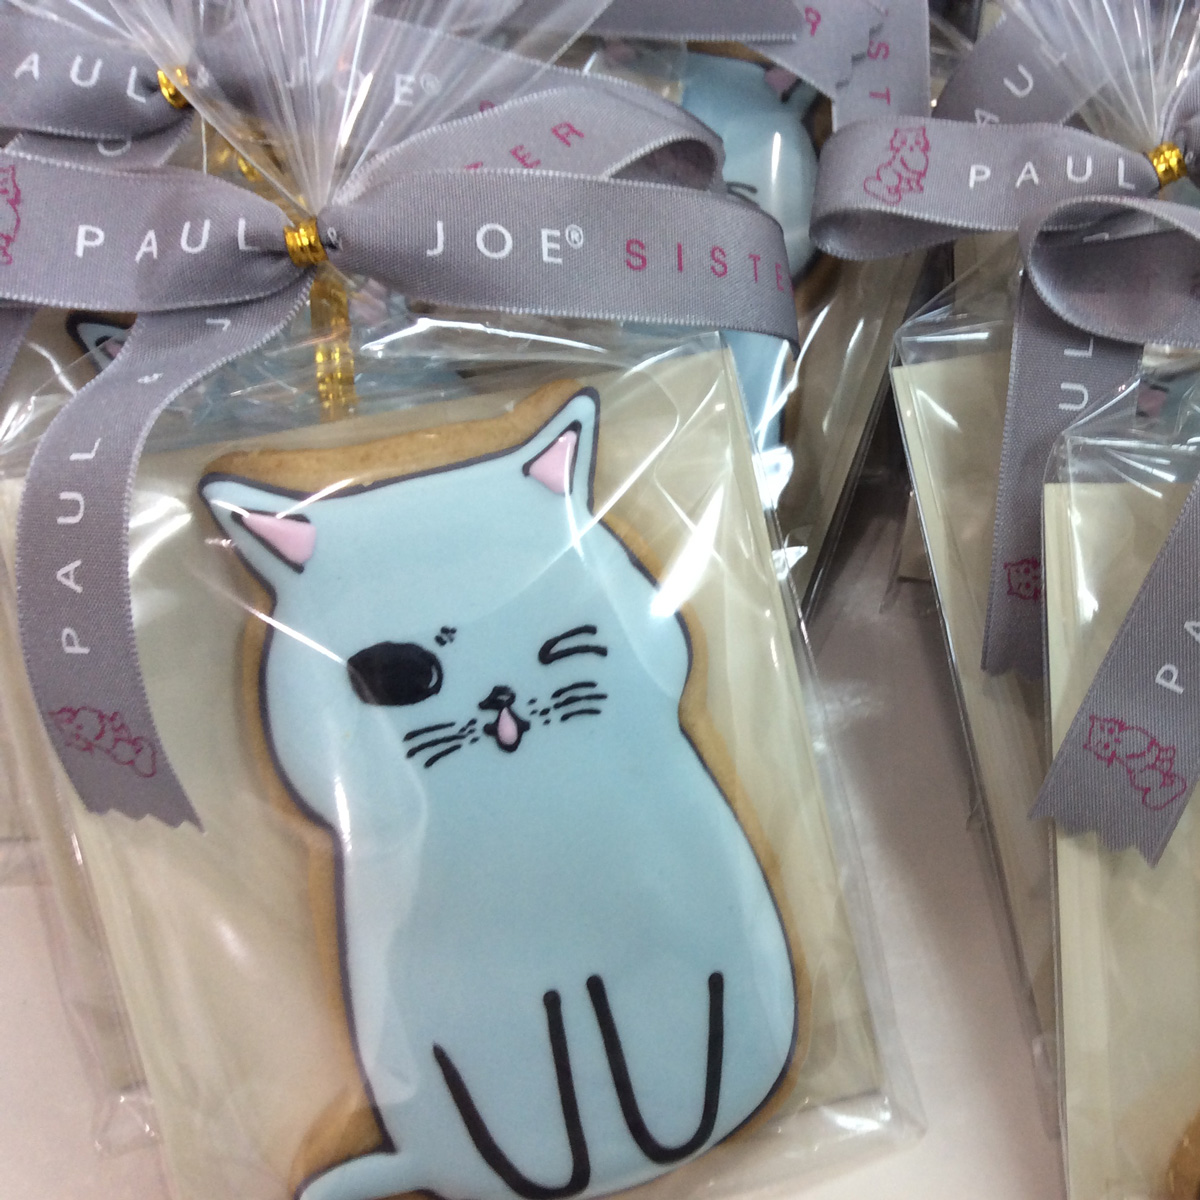 「POUL & JOE SISTER」アイシングクッキー